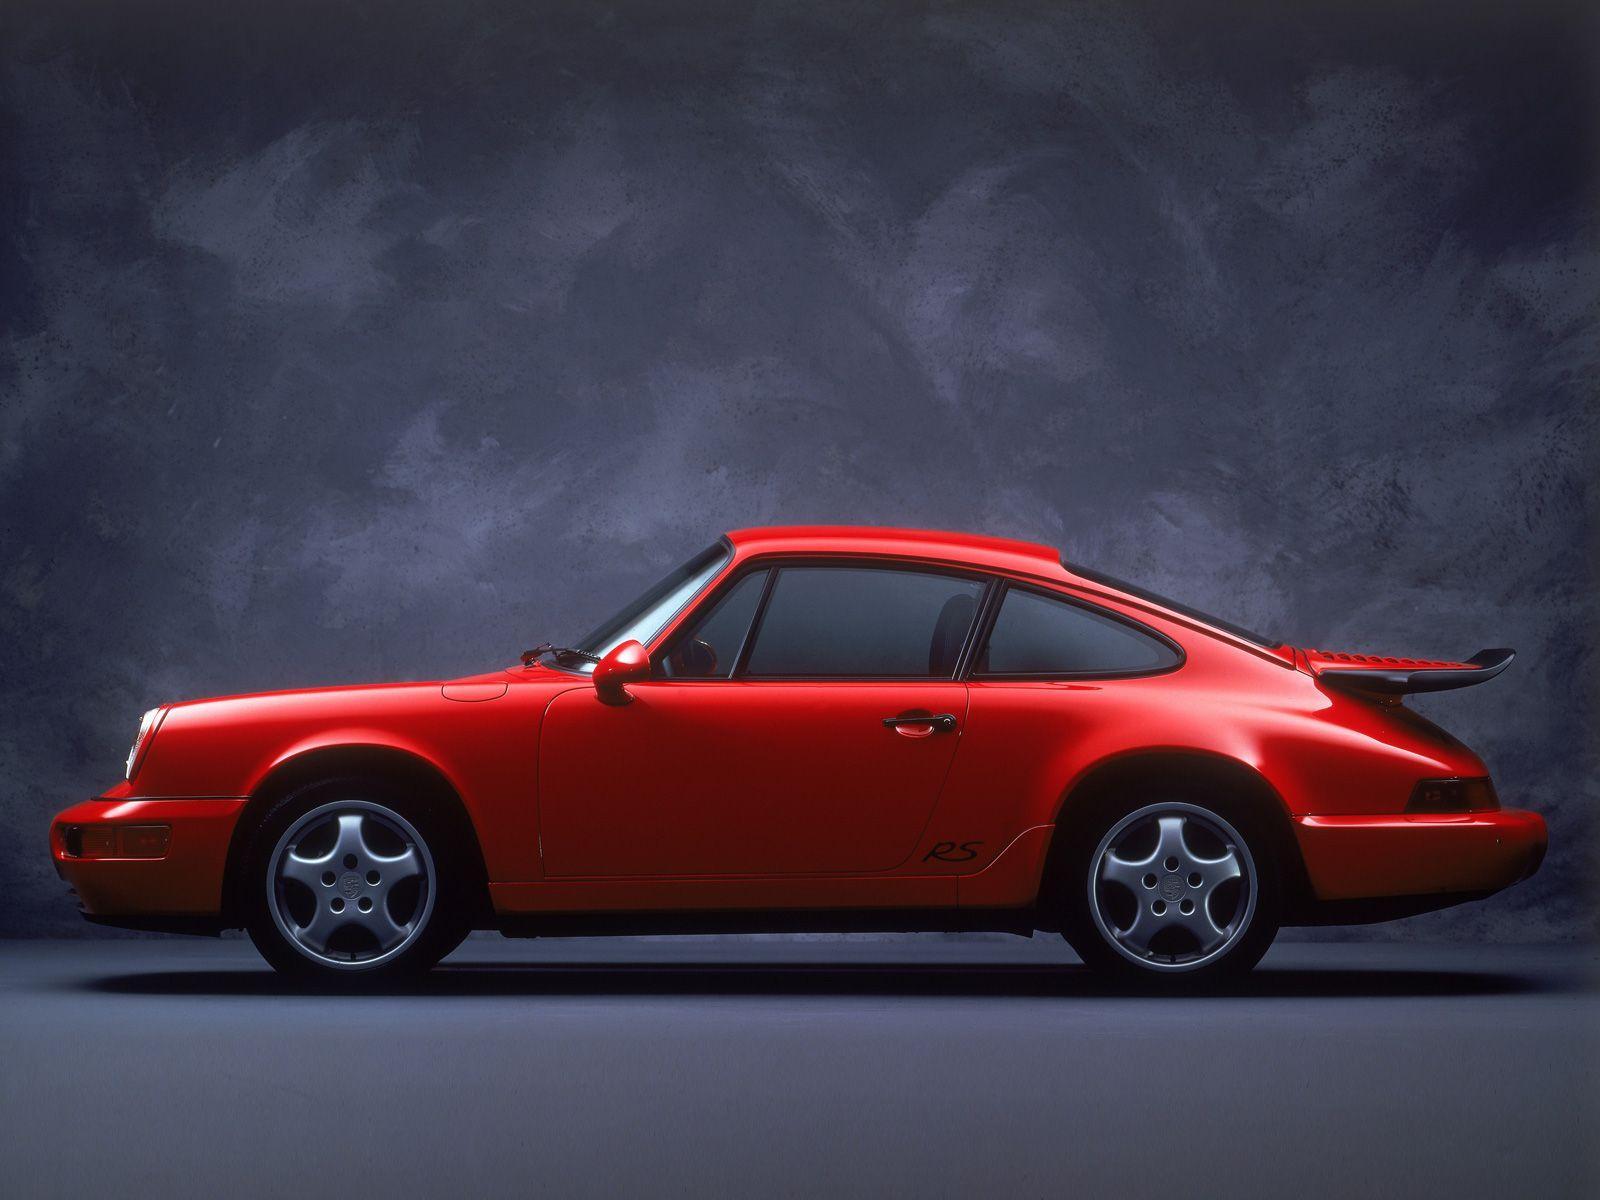 Old Porsche Wallpapers , Top Free Old Porsche Backgrounds